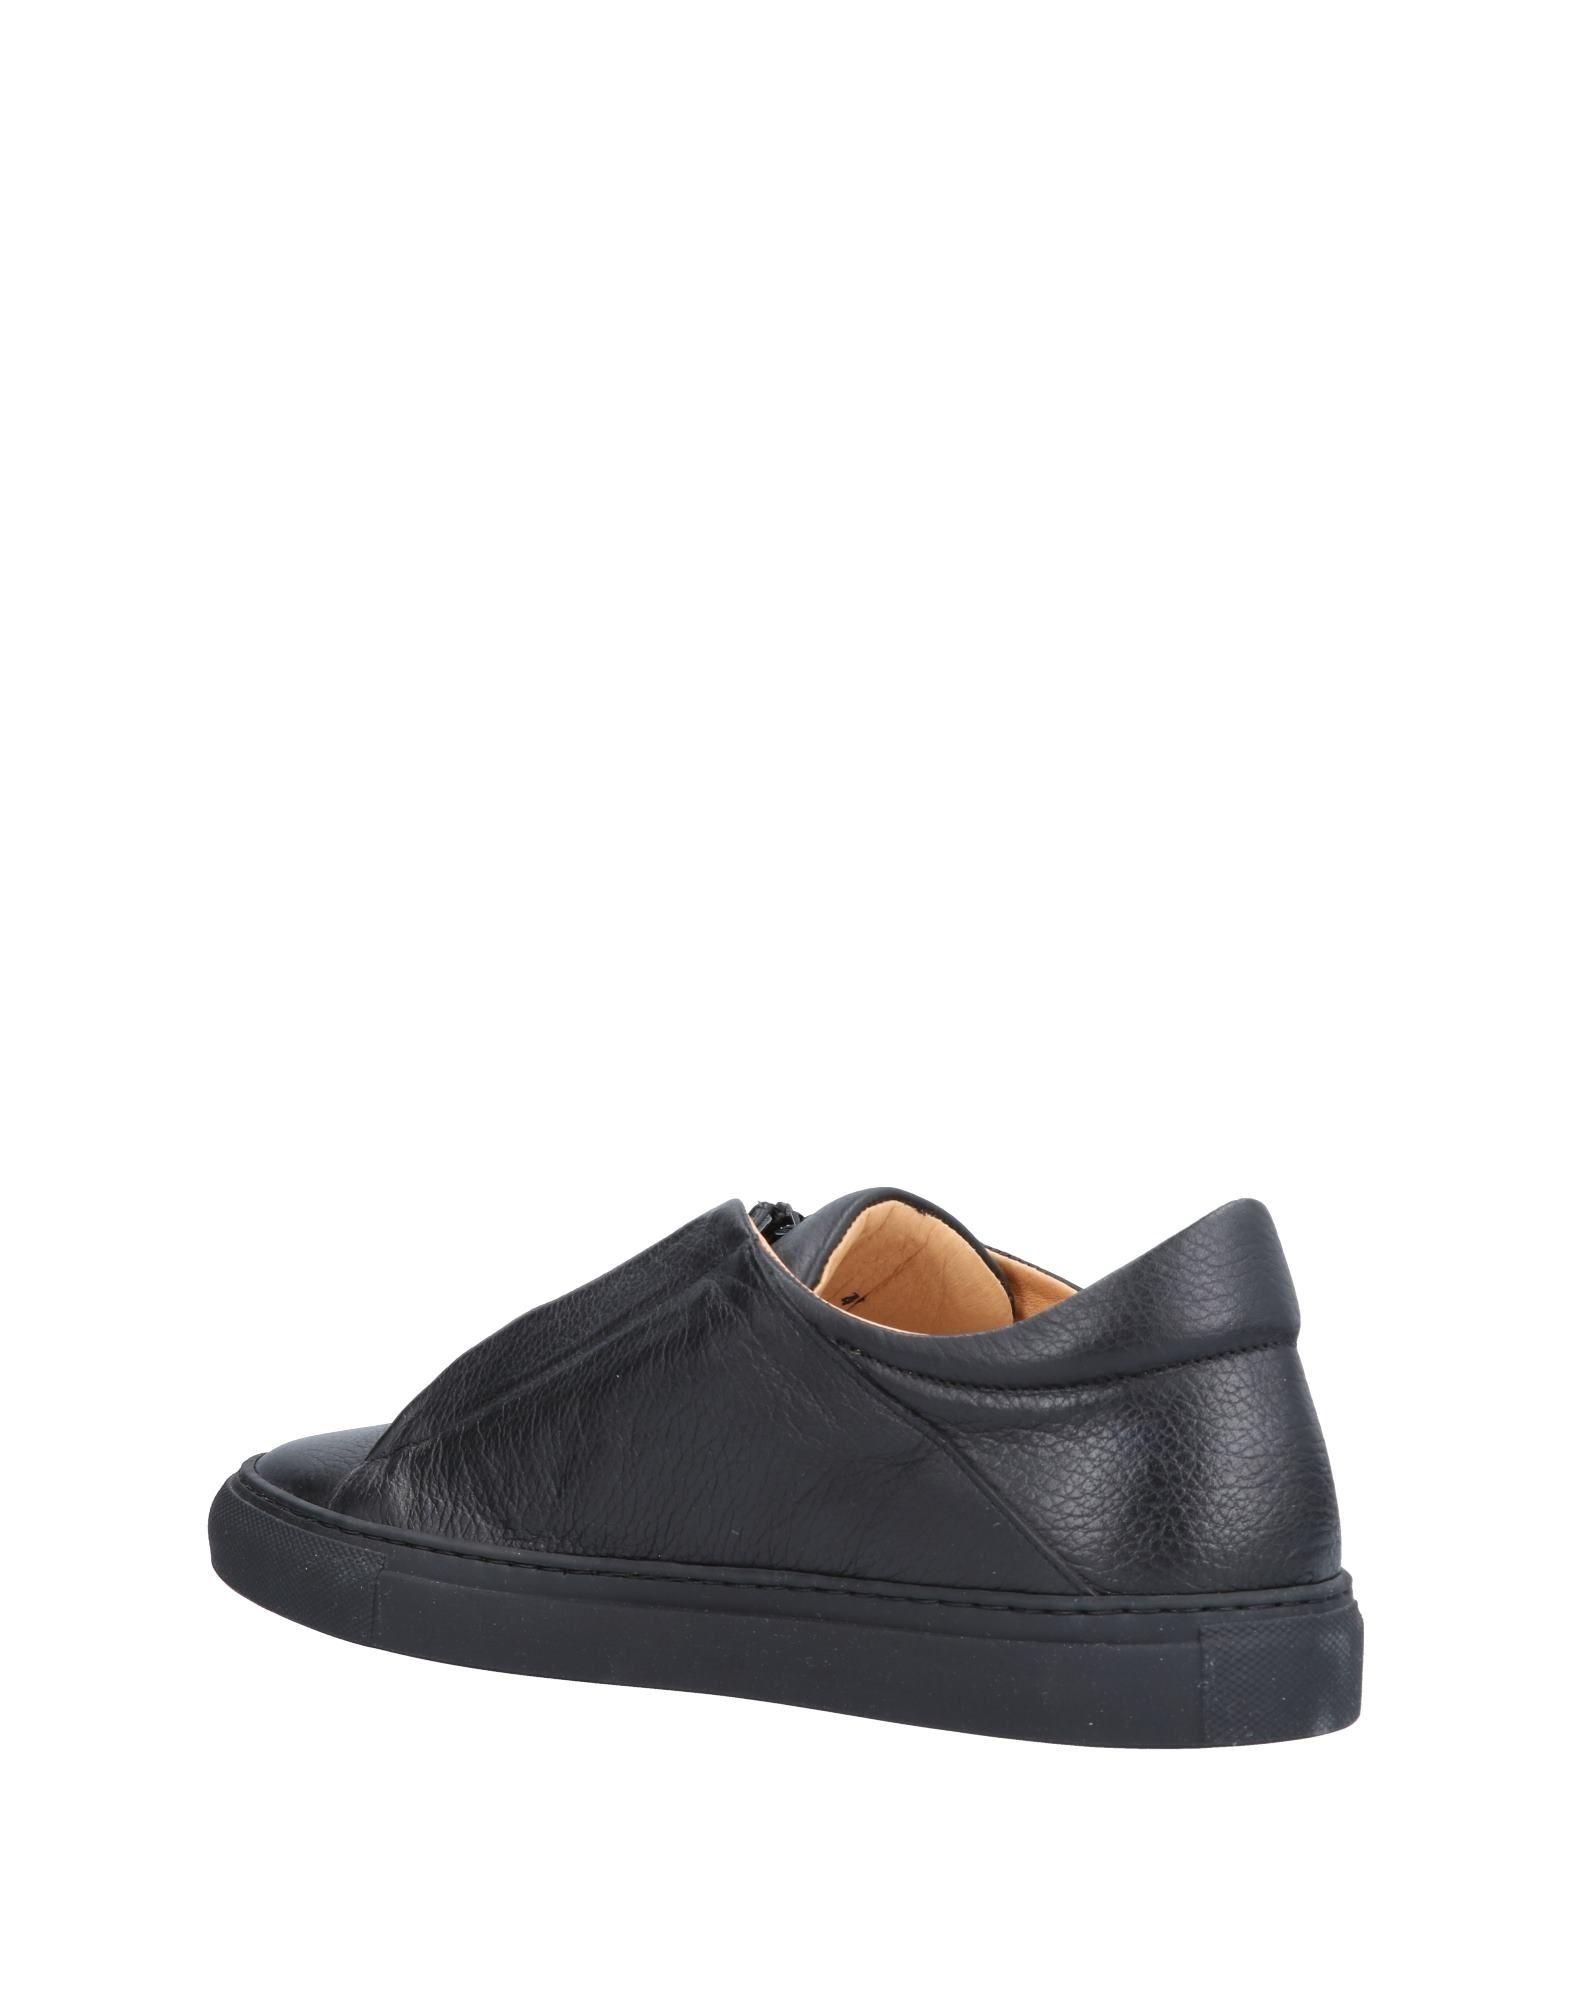 Ylati Schuhe Sneakers Herren  11380012OI Gute Qualität beliebte Schuhe Ylati 86bb0c